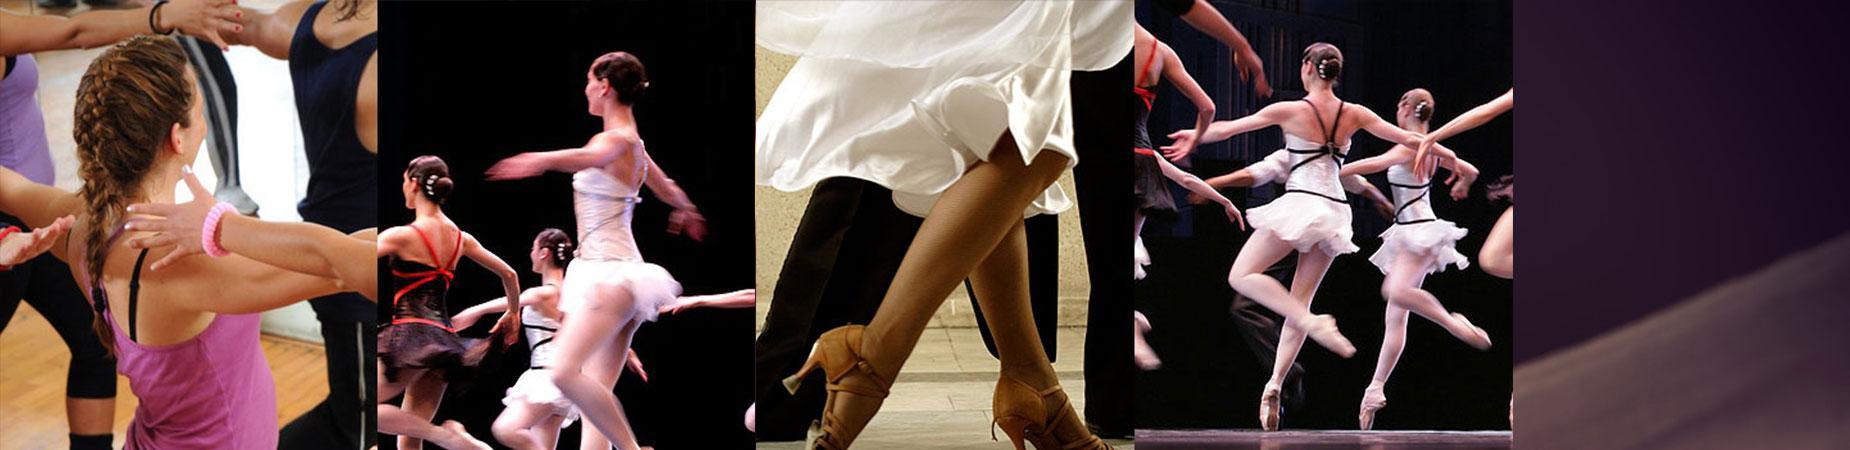 danse contemporaine  79